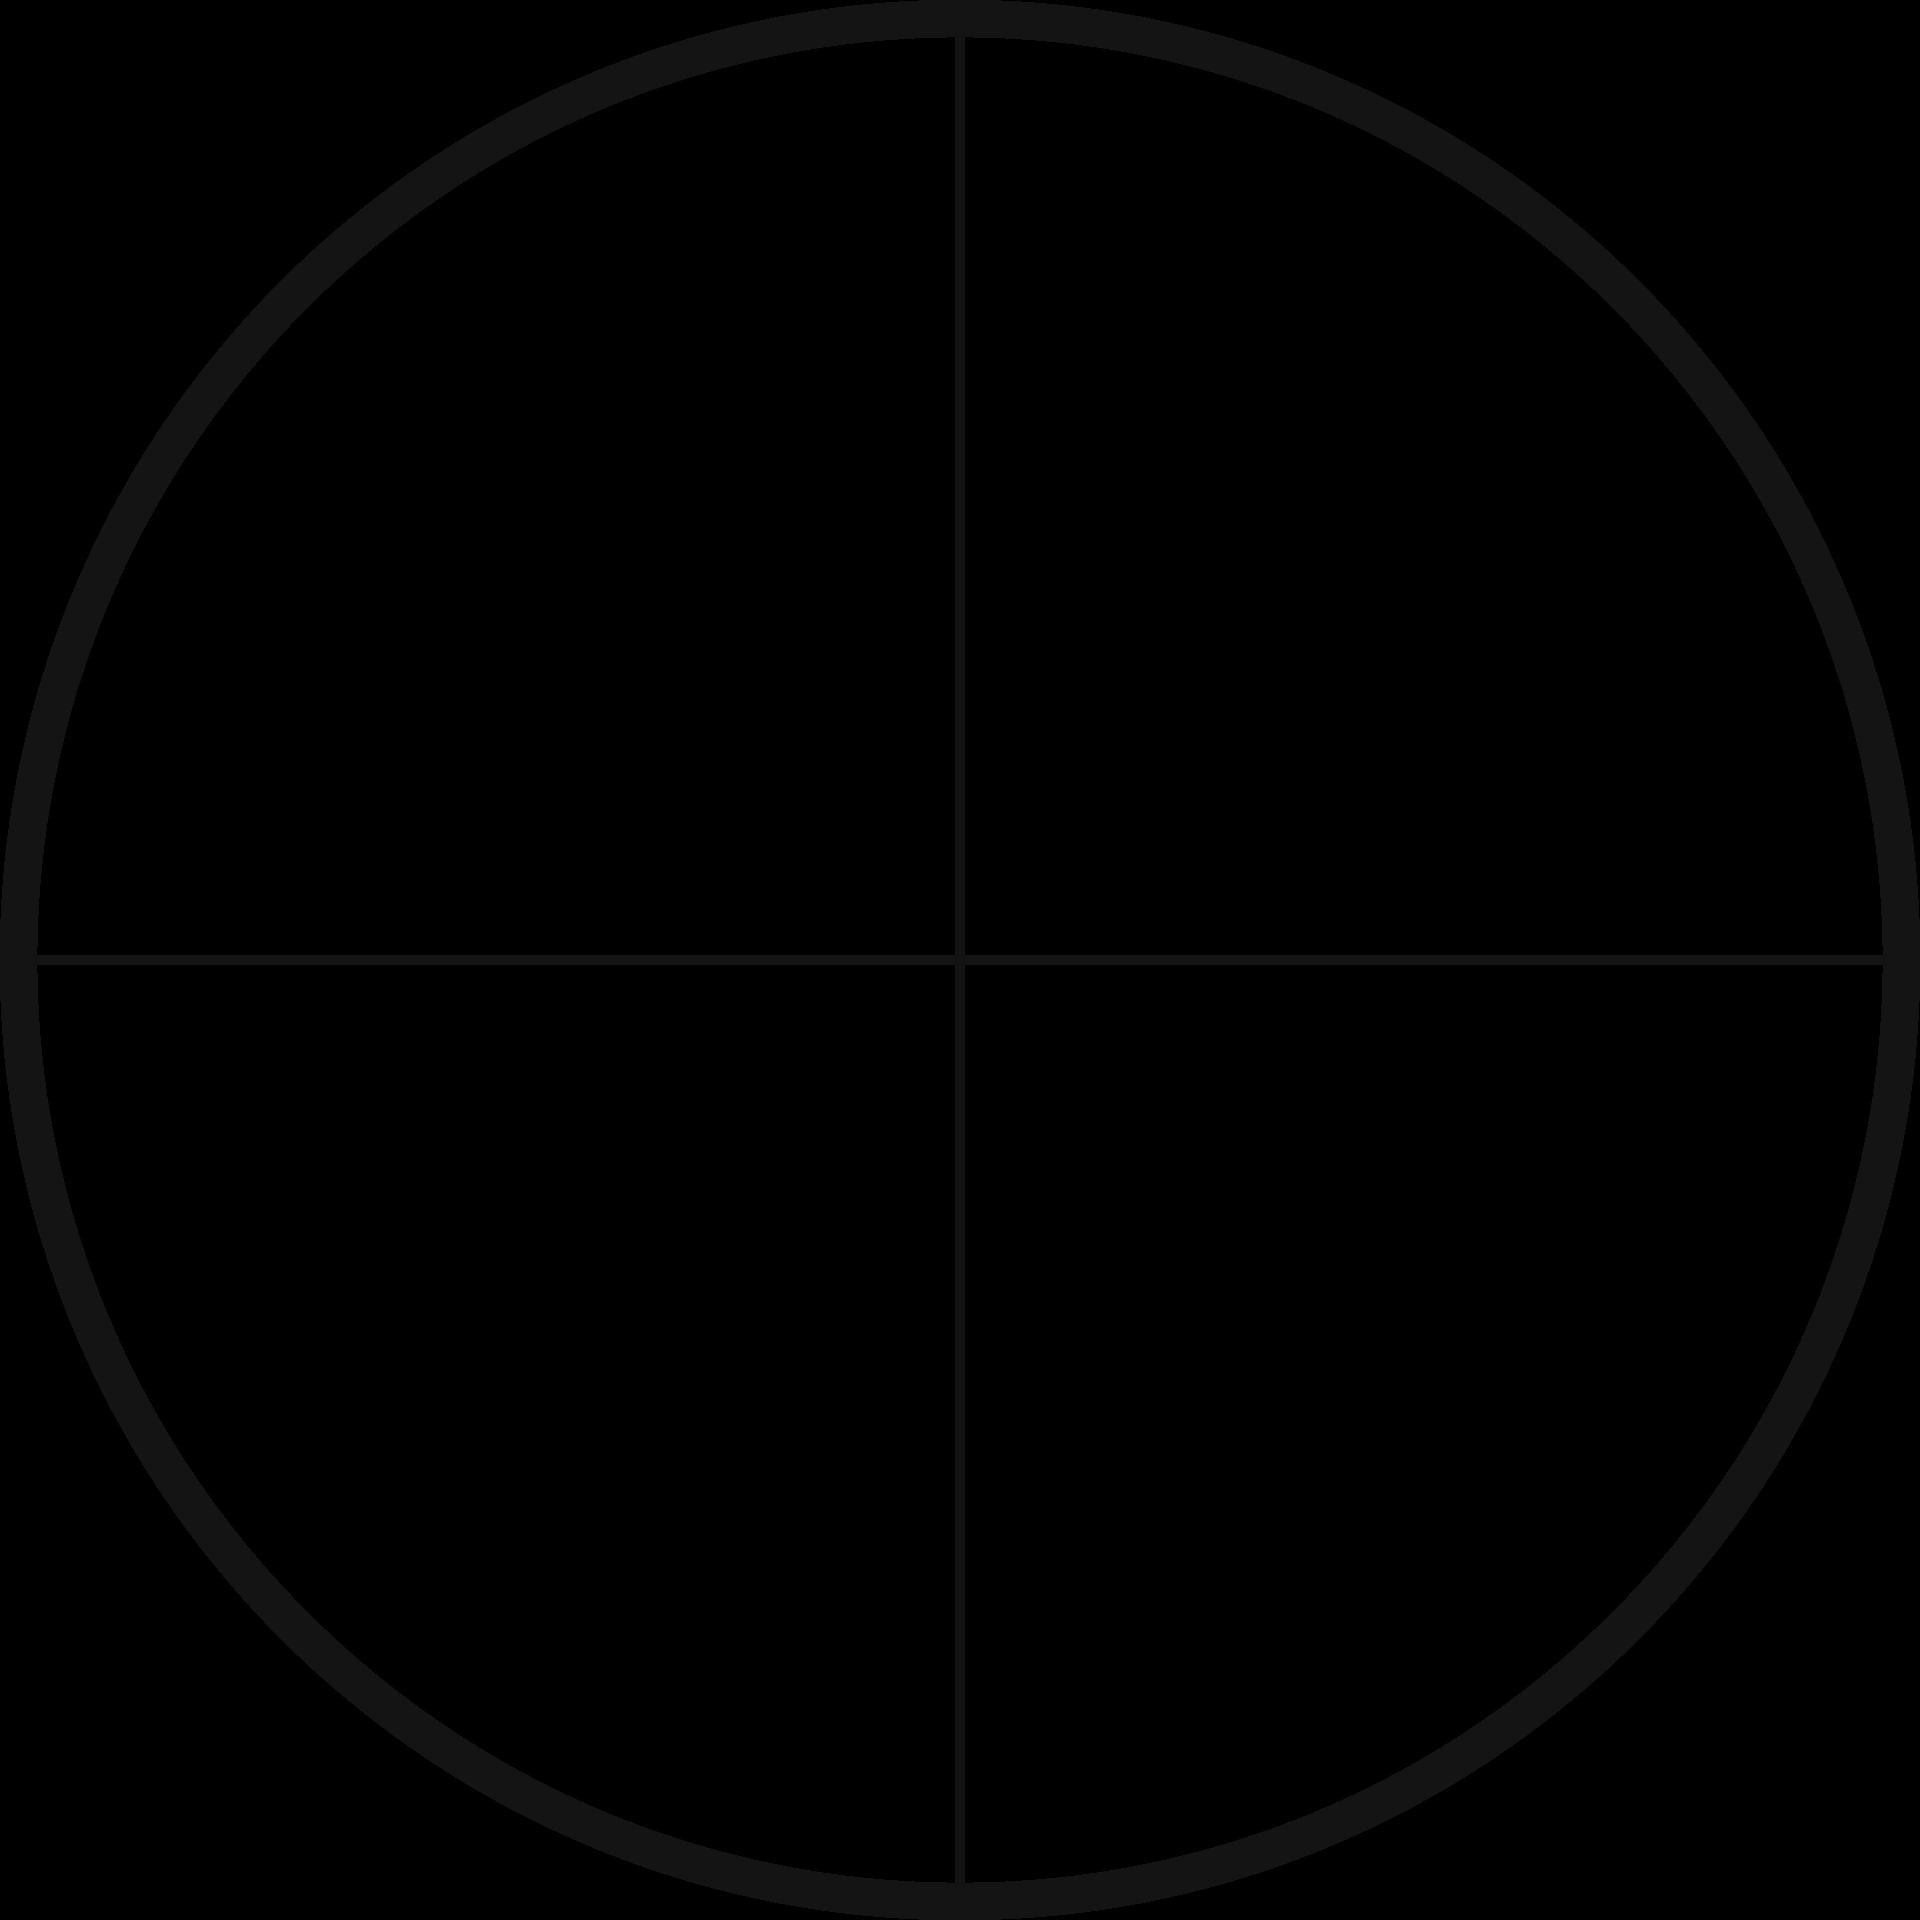 Crosshair Dot